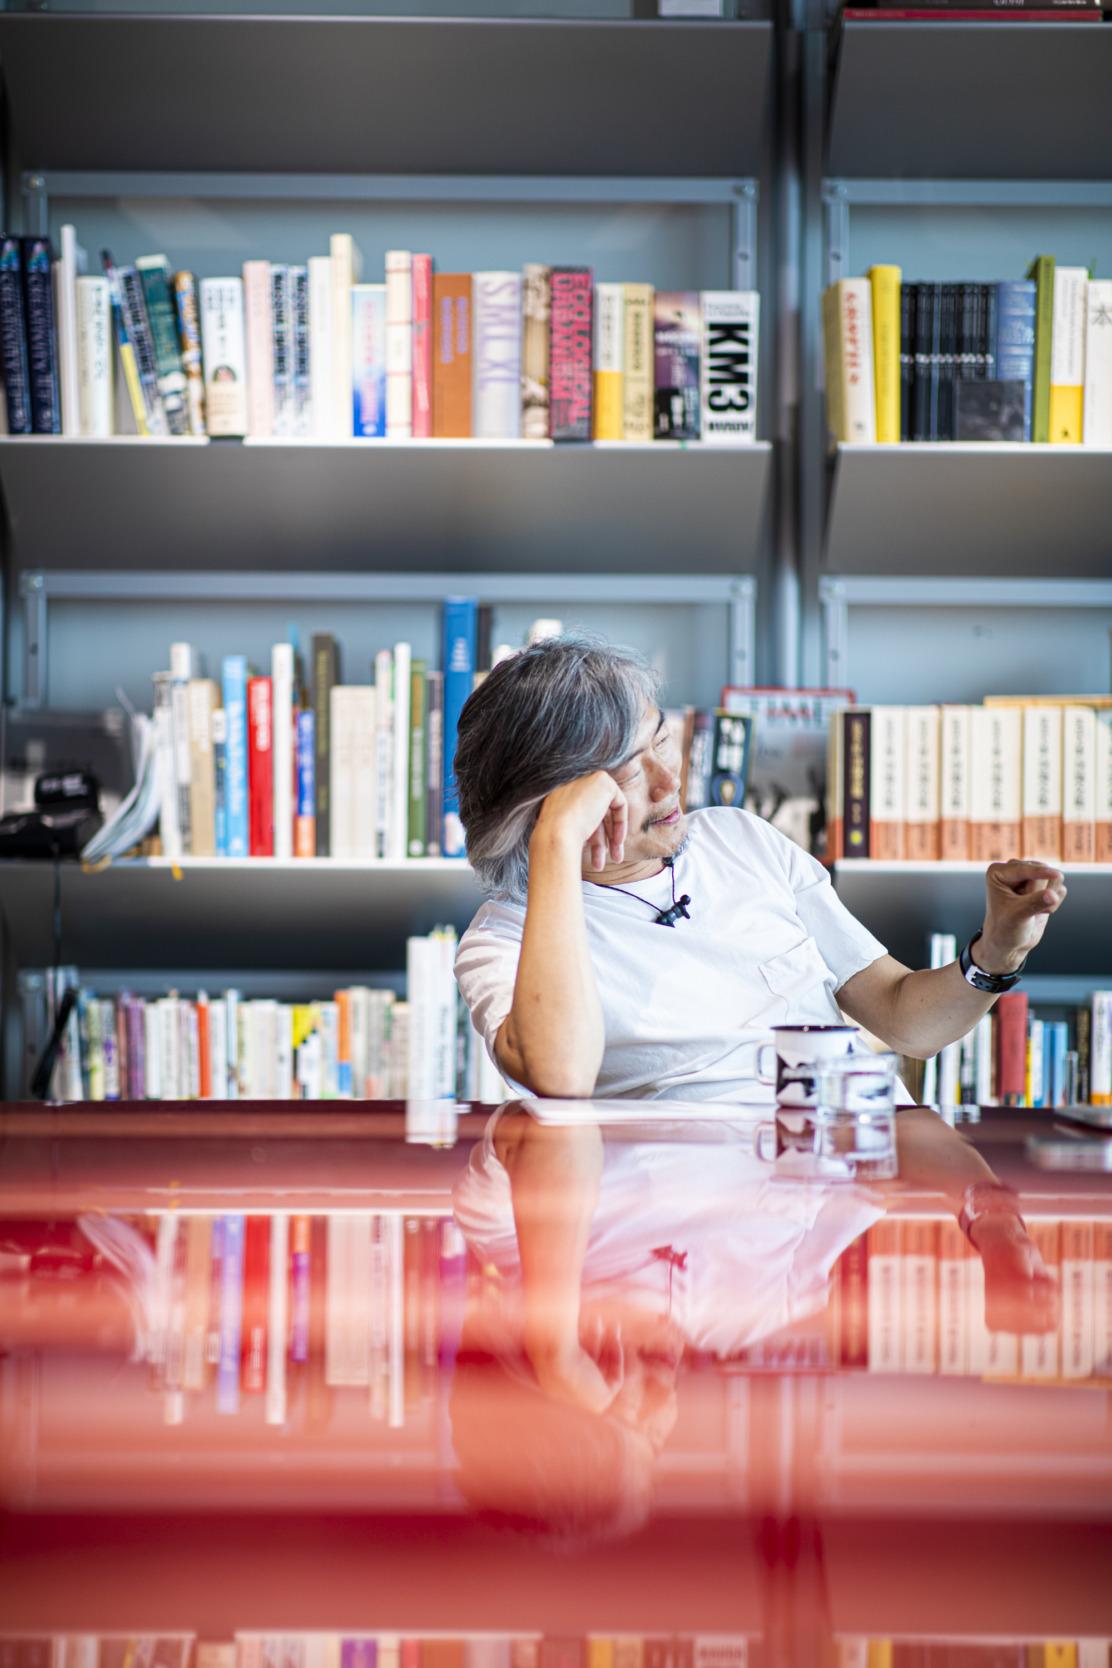 INTERVIEW:「秩序あるカオス」への憧憬を忘れないために / 市耒健太郎|KENTARO ICHIKI